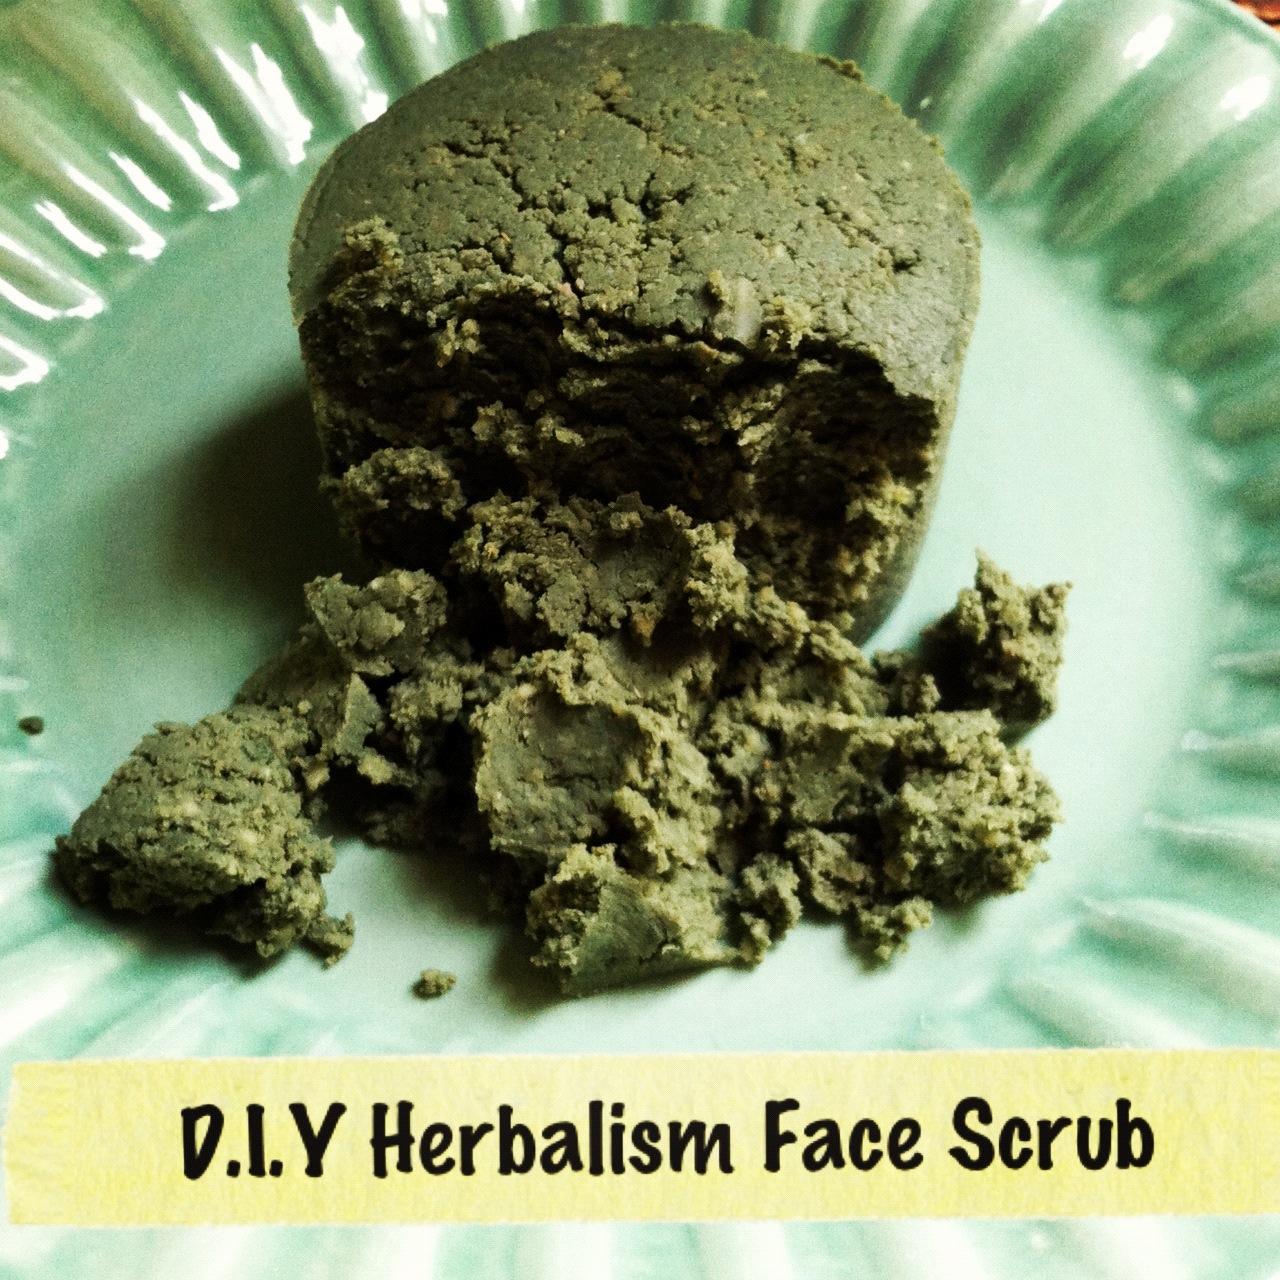 Fresh picked beauty diy herbalism face scrub diy herbalism face scrub solutioingenieria Gallery